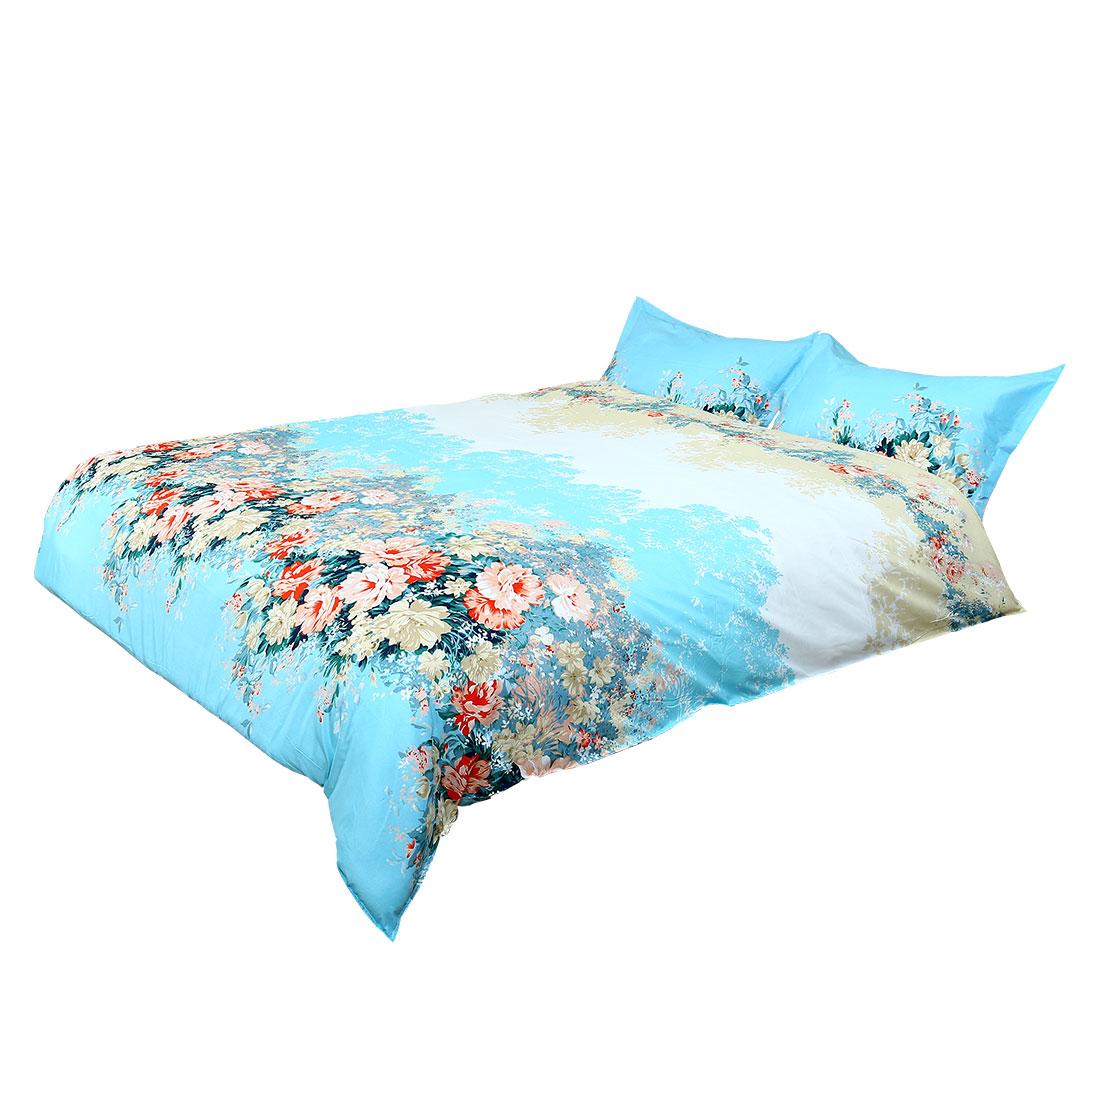 Flower Pattern Duvet Cover Pillowcase Quilt Cover Bedding Set Single Size Teal